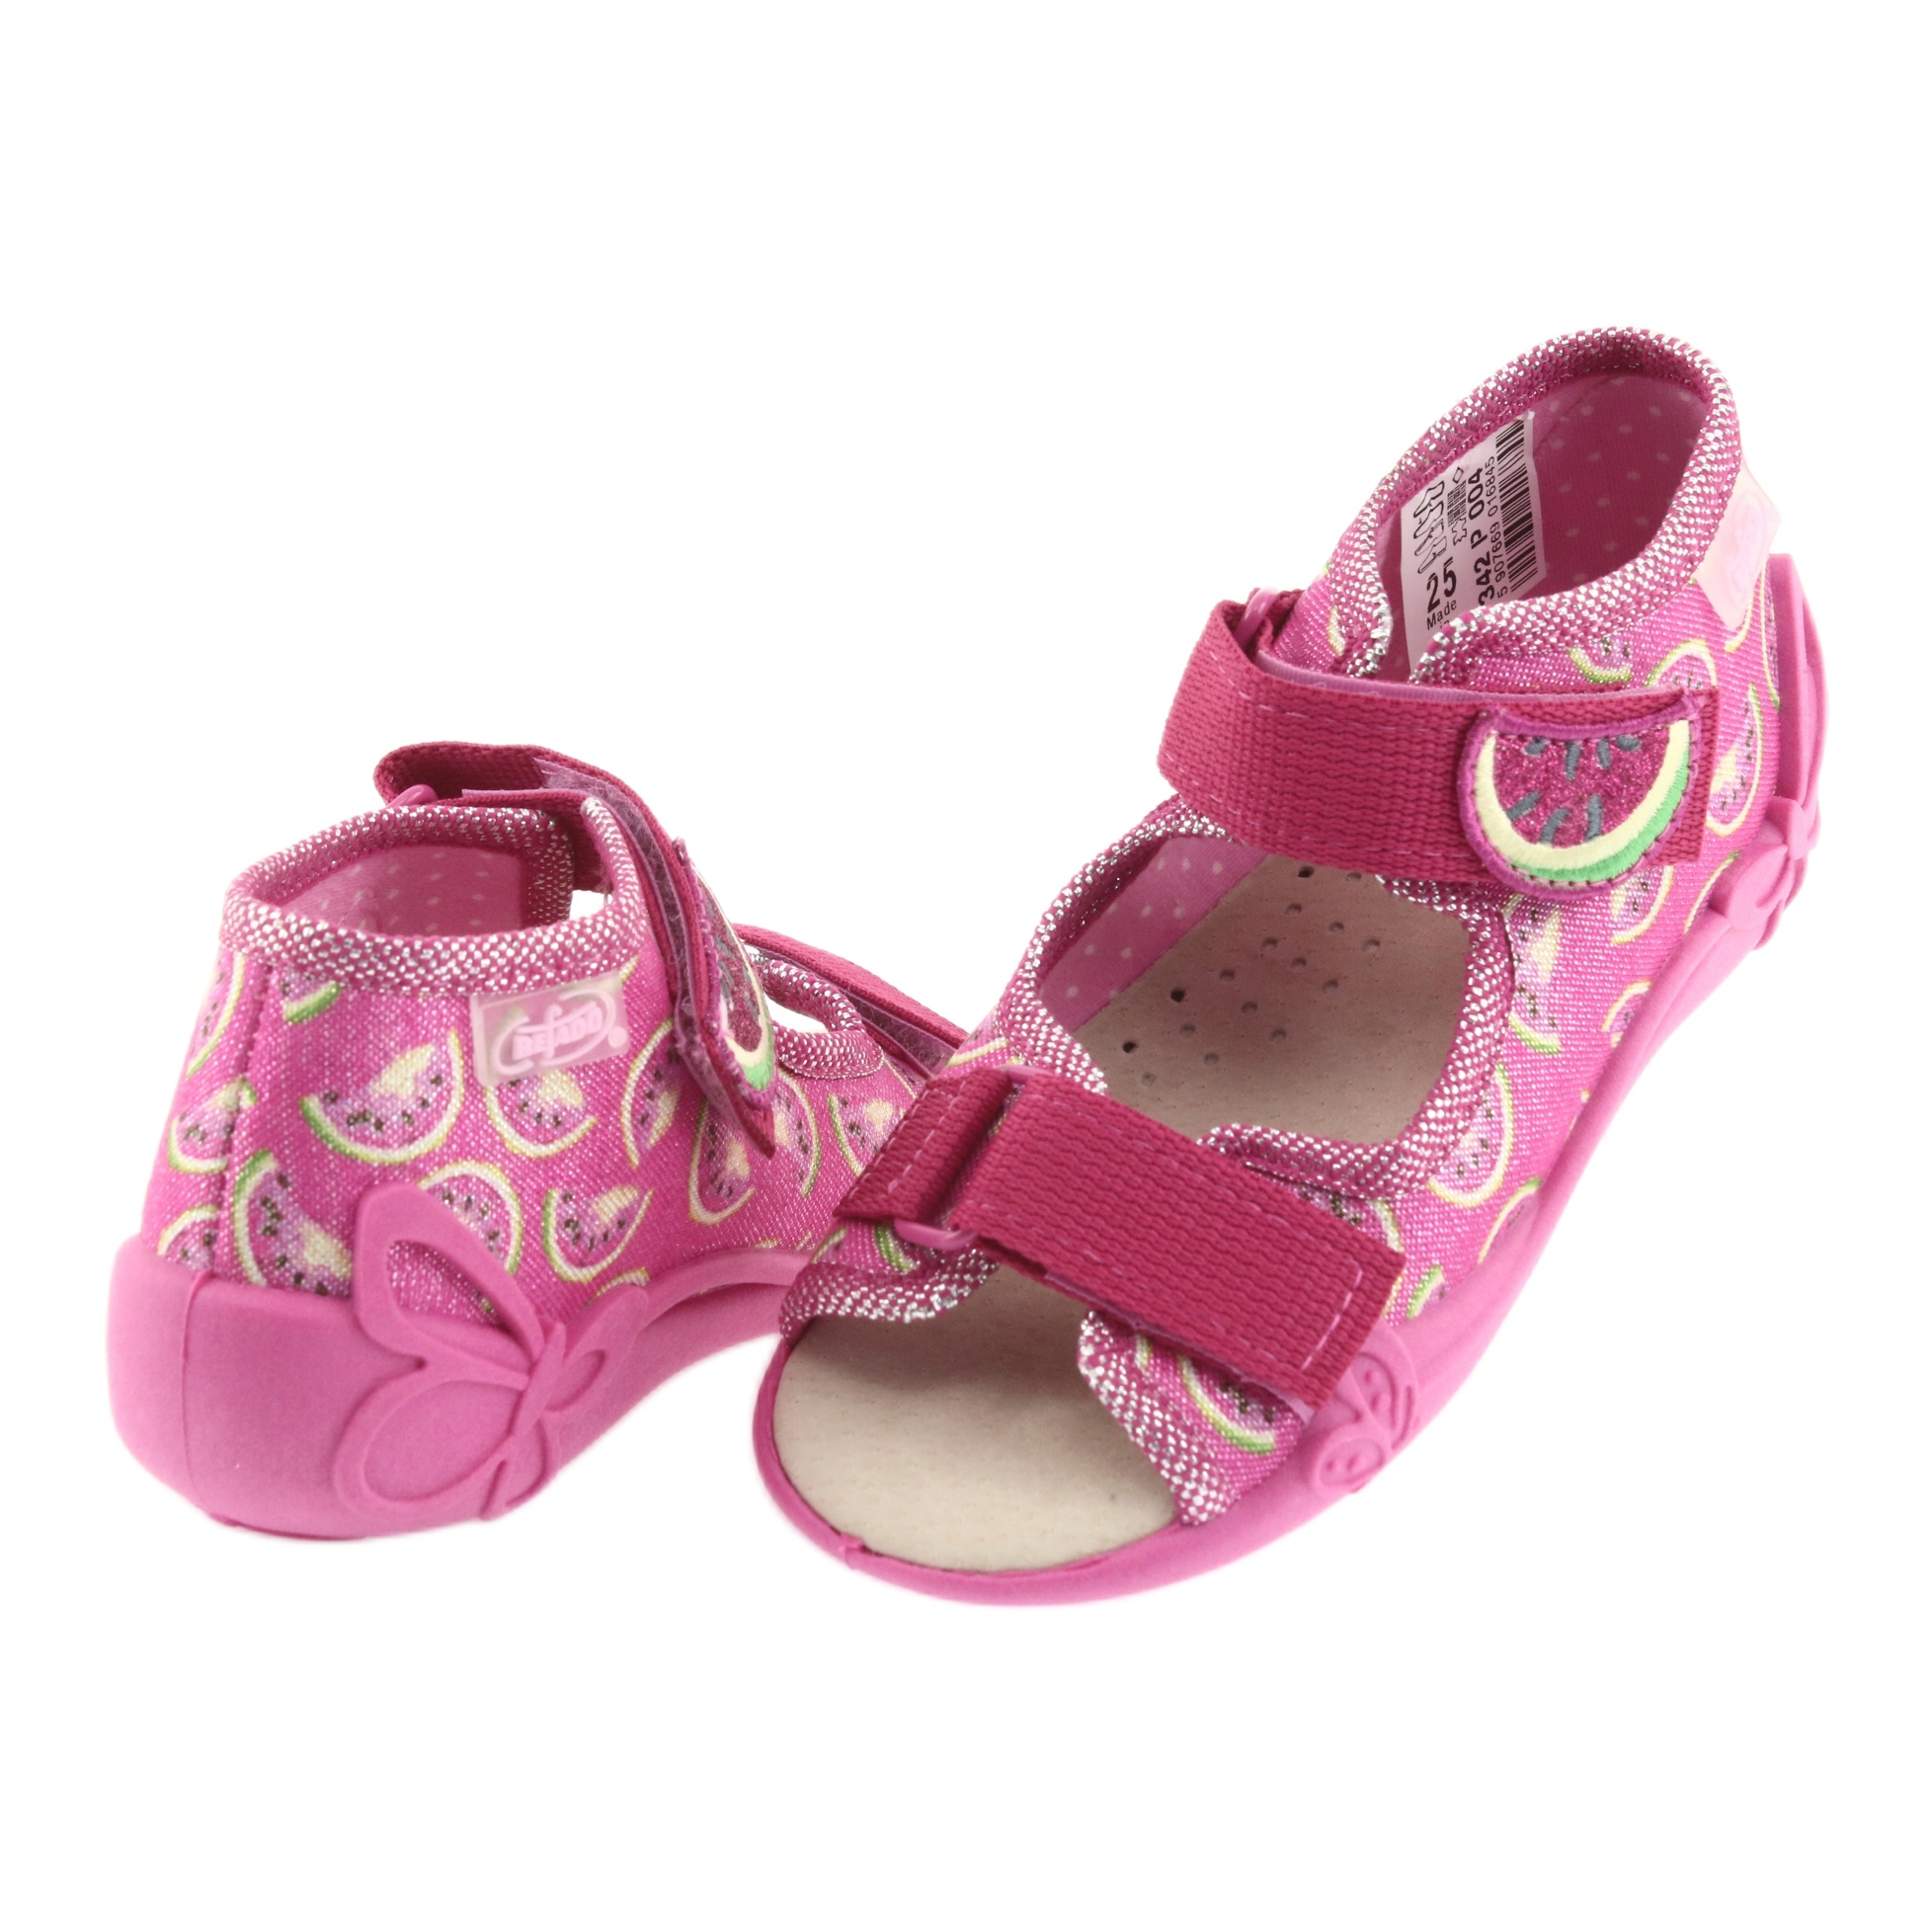 miniatura 5 - Sandali Befado scarpe da bambino 342P004 angurie grigio verde giallo rosa